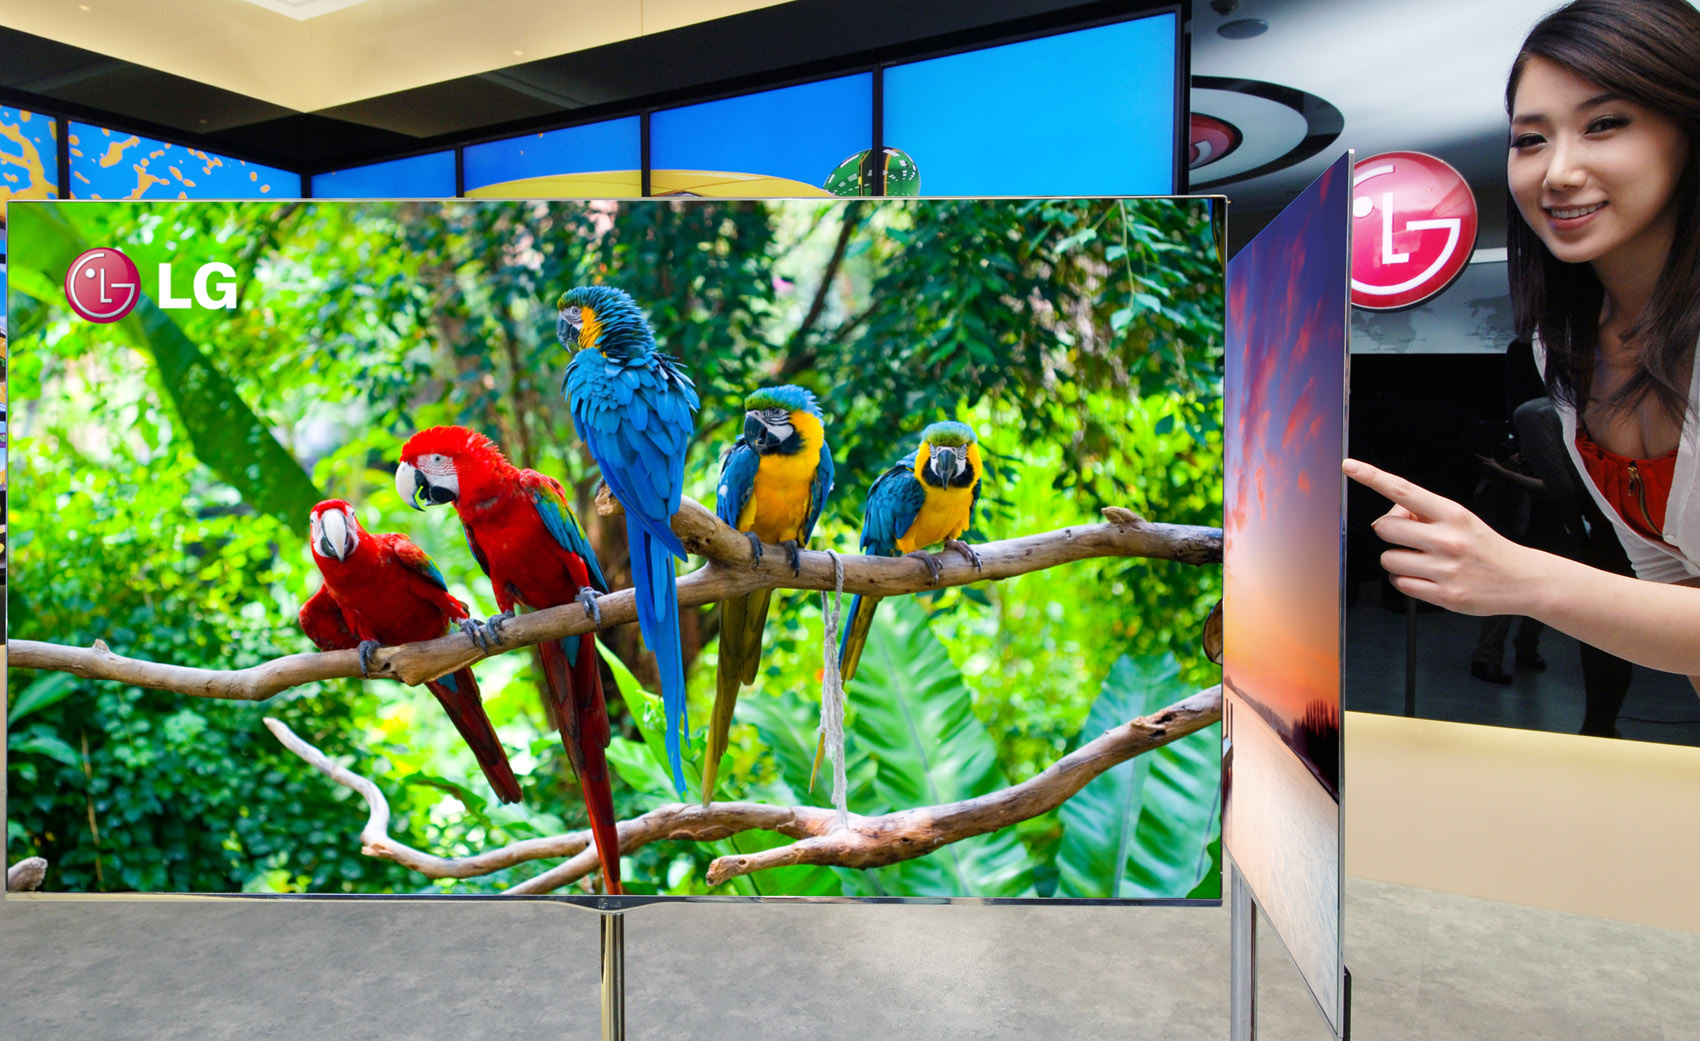 LG compite con televisores curvos